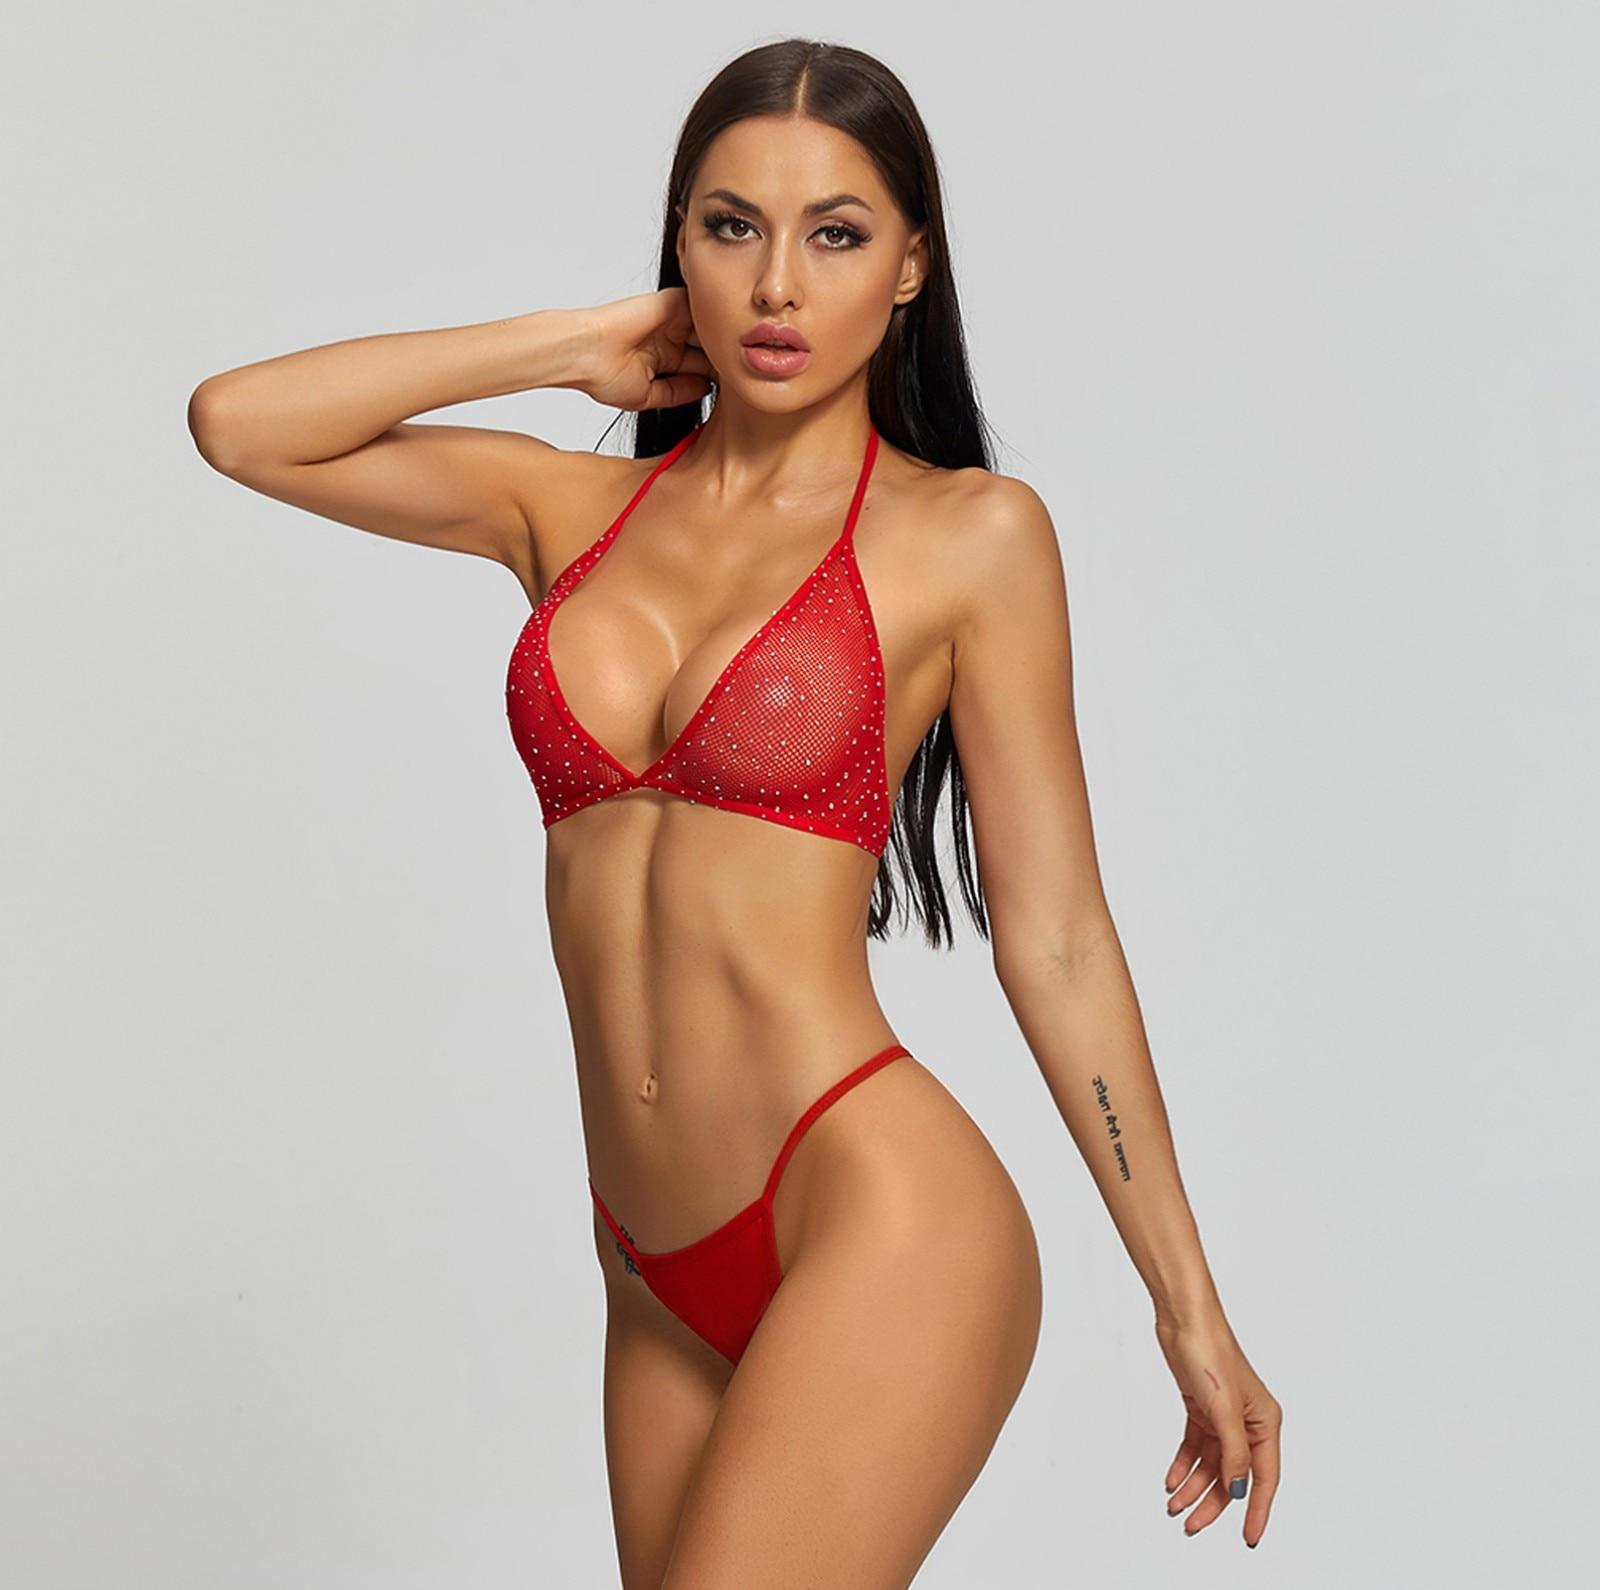 New Sexy Mesh Lace Women Sheer Rhinestone Top Thong Fishnet Lingerie Set Christmas Sexy Glamorous Seductive Red Fashionable